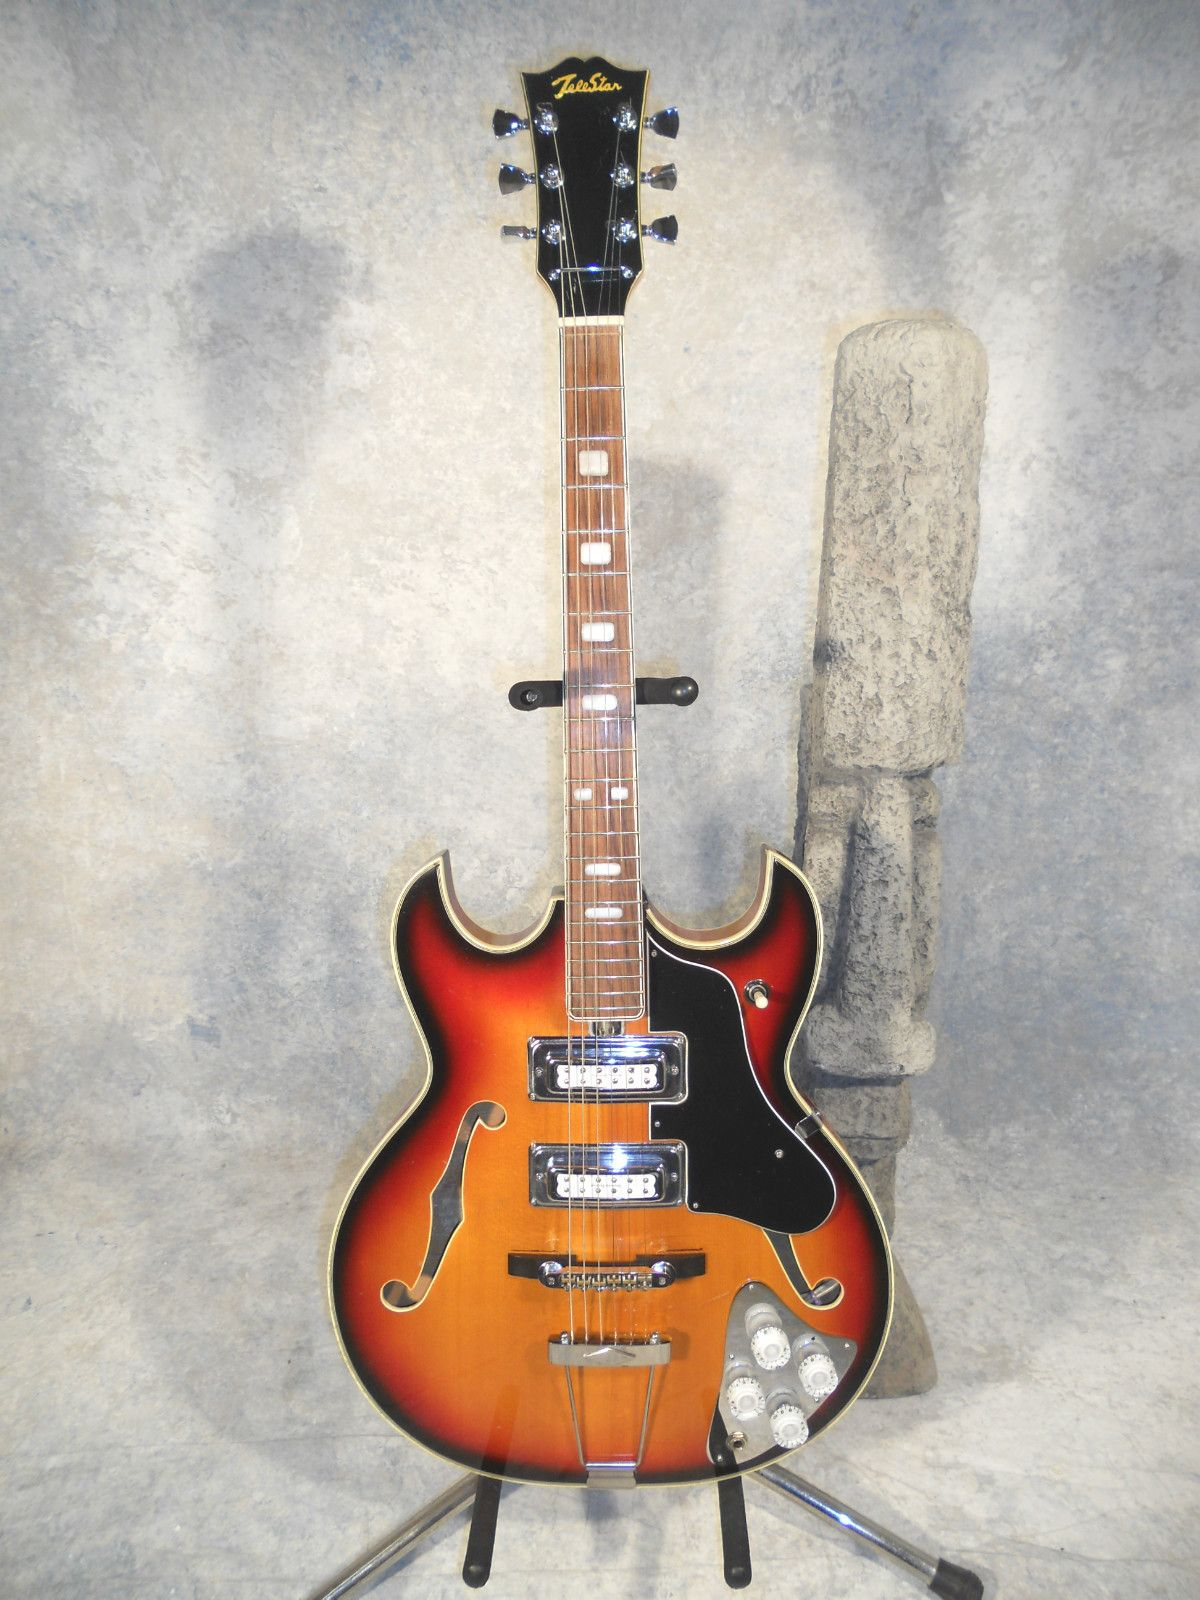 telestar teisco hollowbody 335 style vintage 60s cool ese telestar teisco hollowbody 335 style vintage 60s